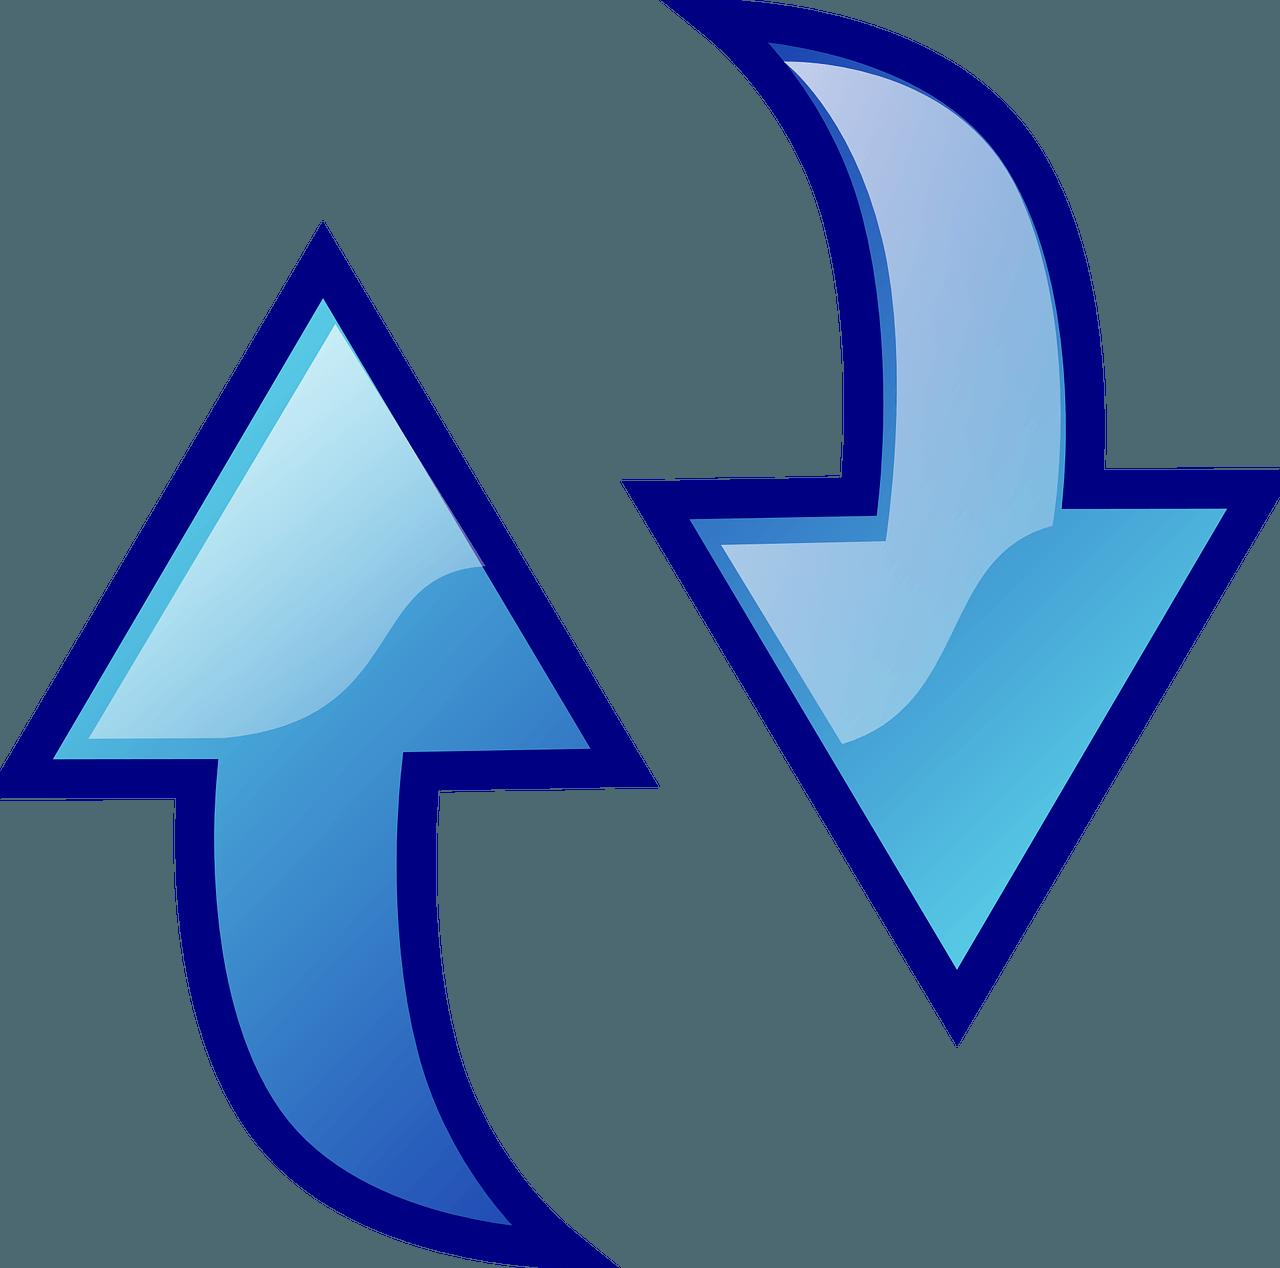 Curved Arrow Clipart Clipart Curved Arrows Free Clip Curved Arrow Clip Art Blue Png Download 310746 Is A Creative Cl Curved Arrow Arrow Clipart Clip Art